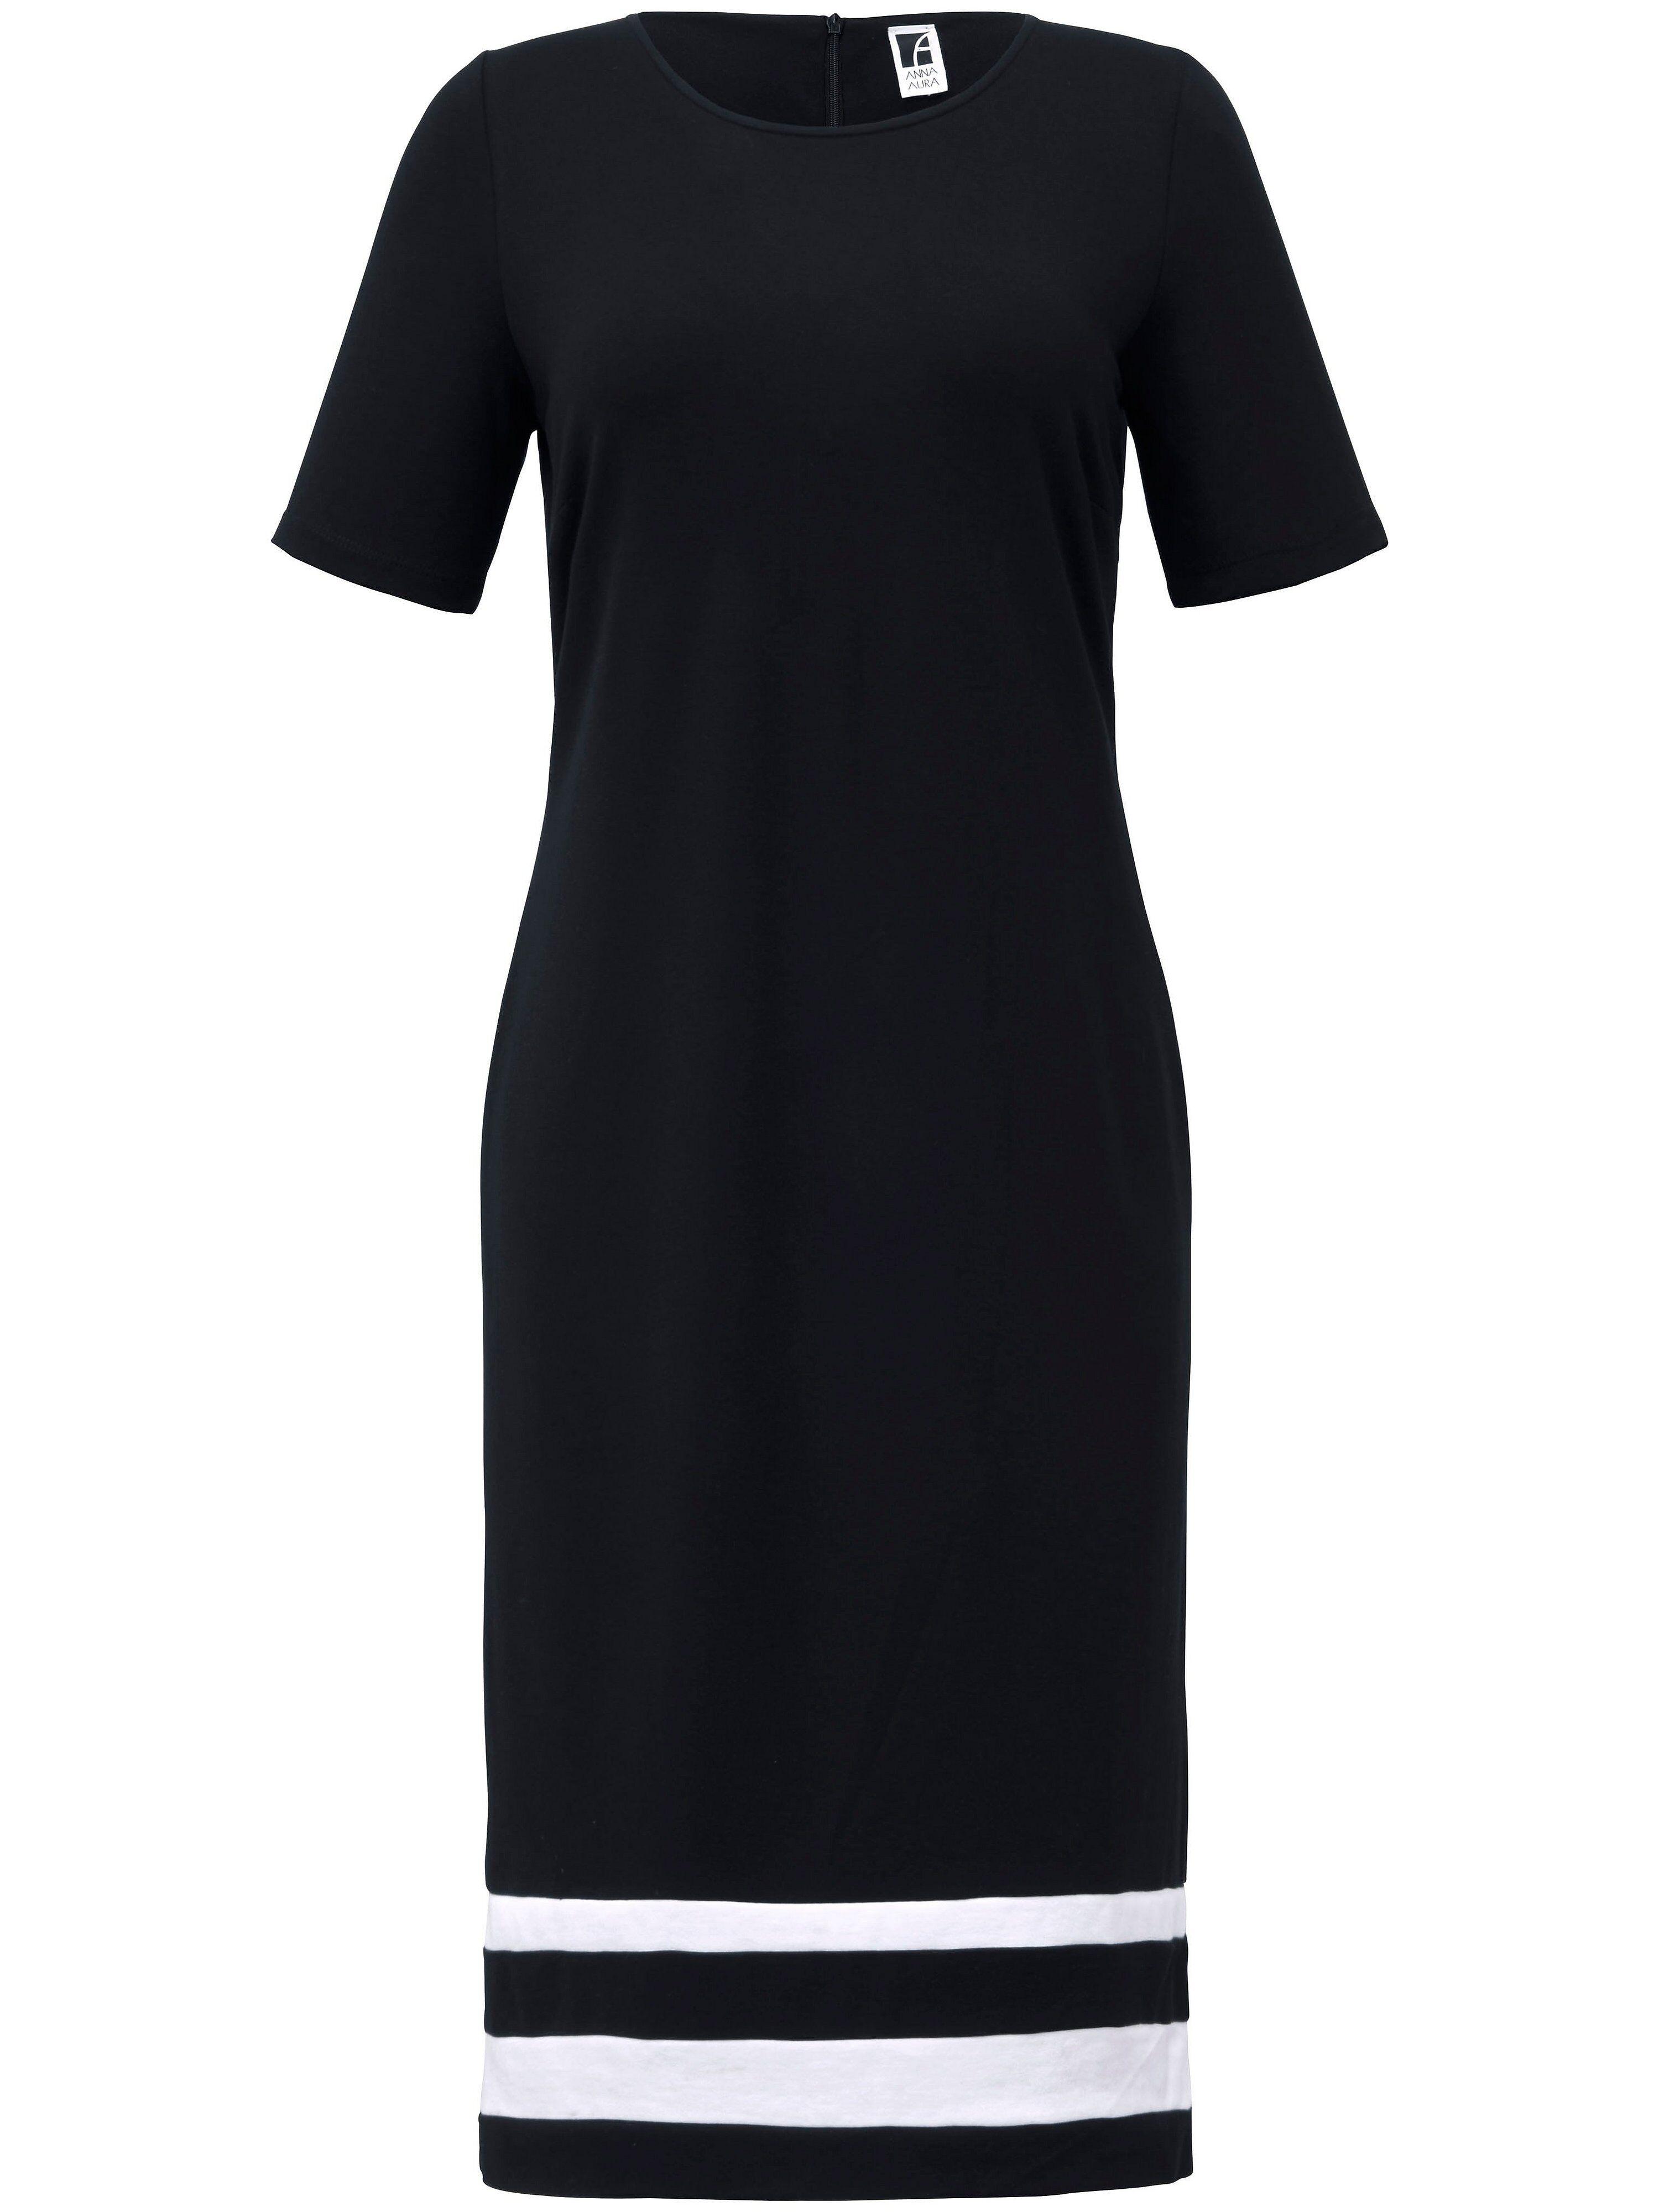 Anna Aura La robe en jersey, ligne fourreau, manches courtes  Anna Aura noir  - Femme - 44